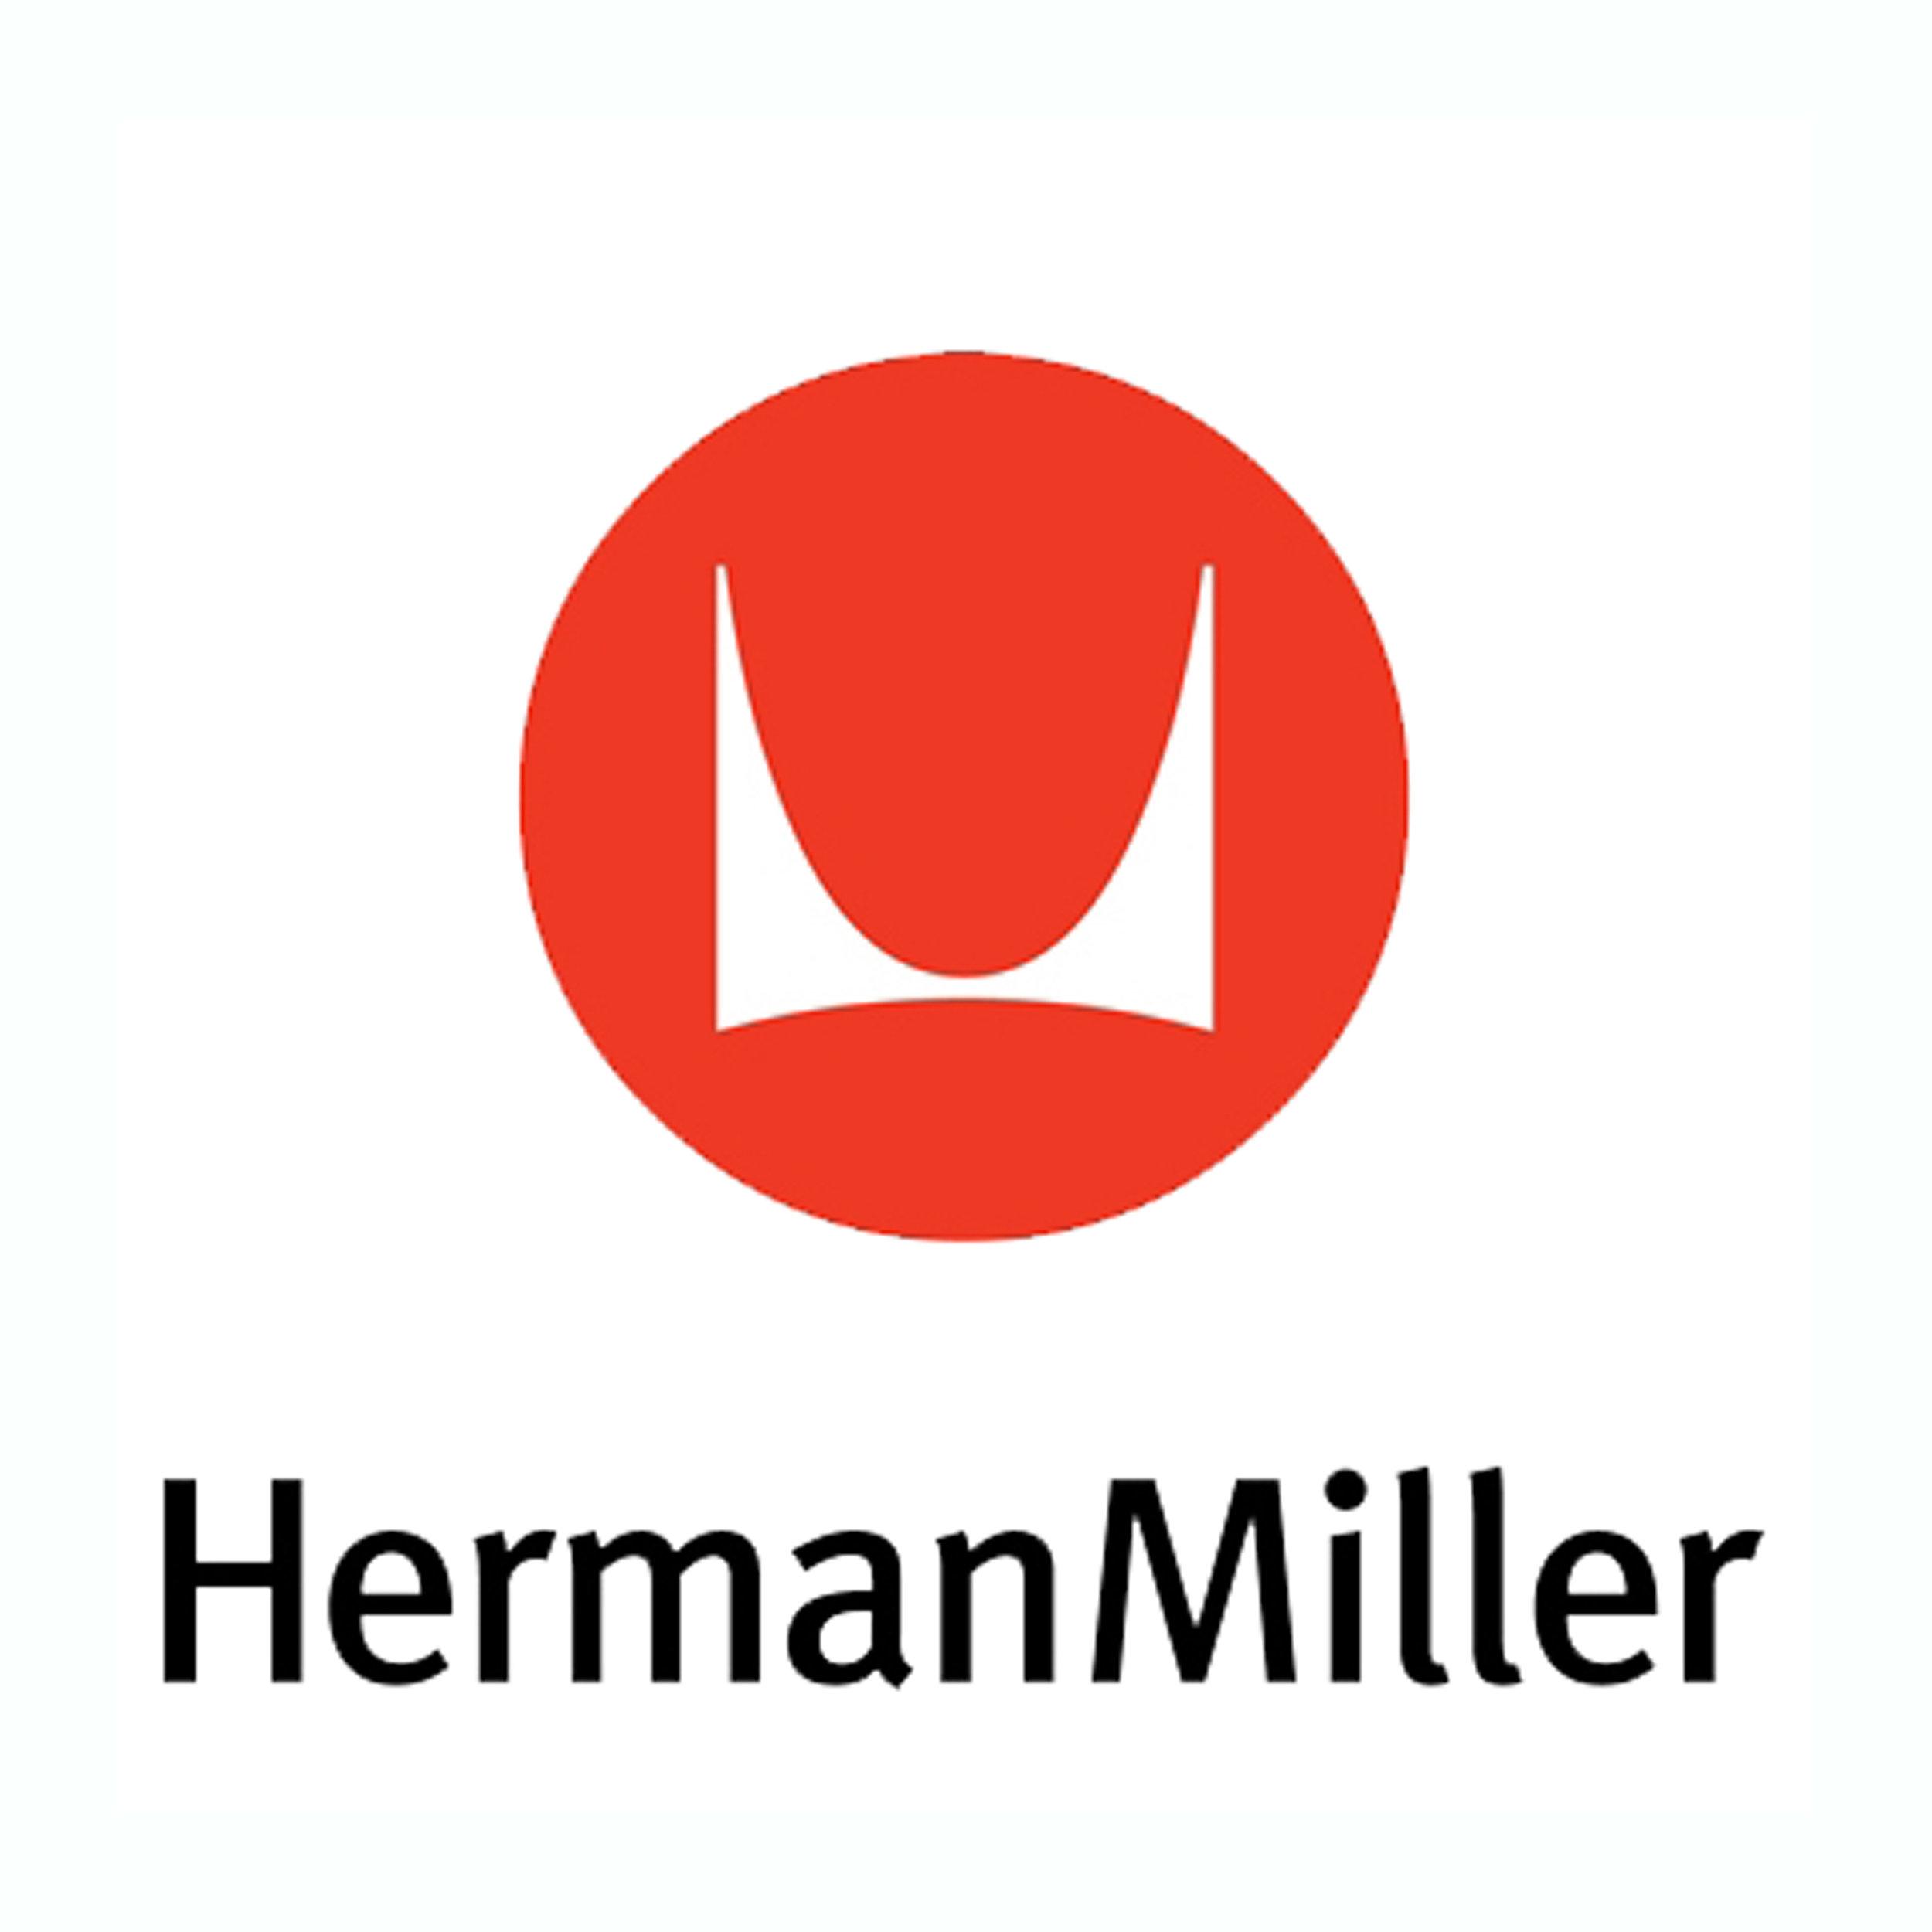 Herman Miller_2.jpg